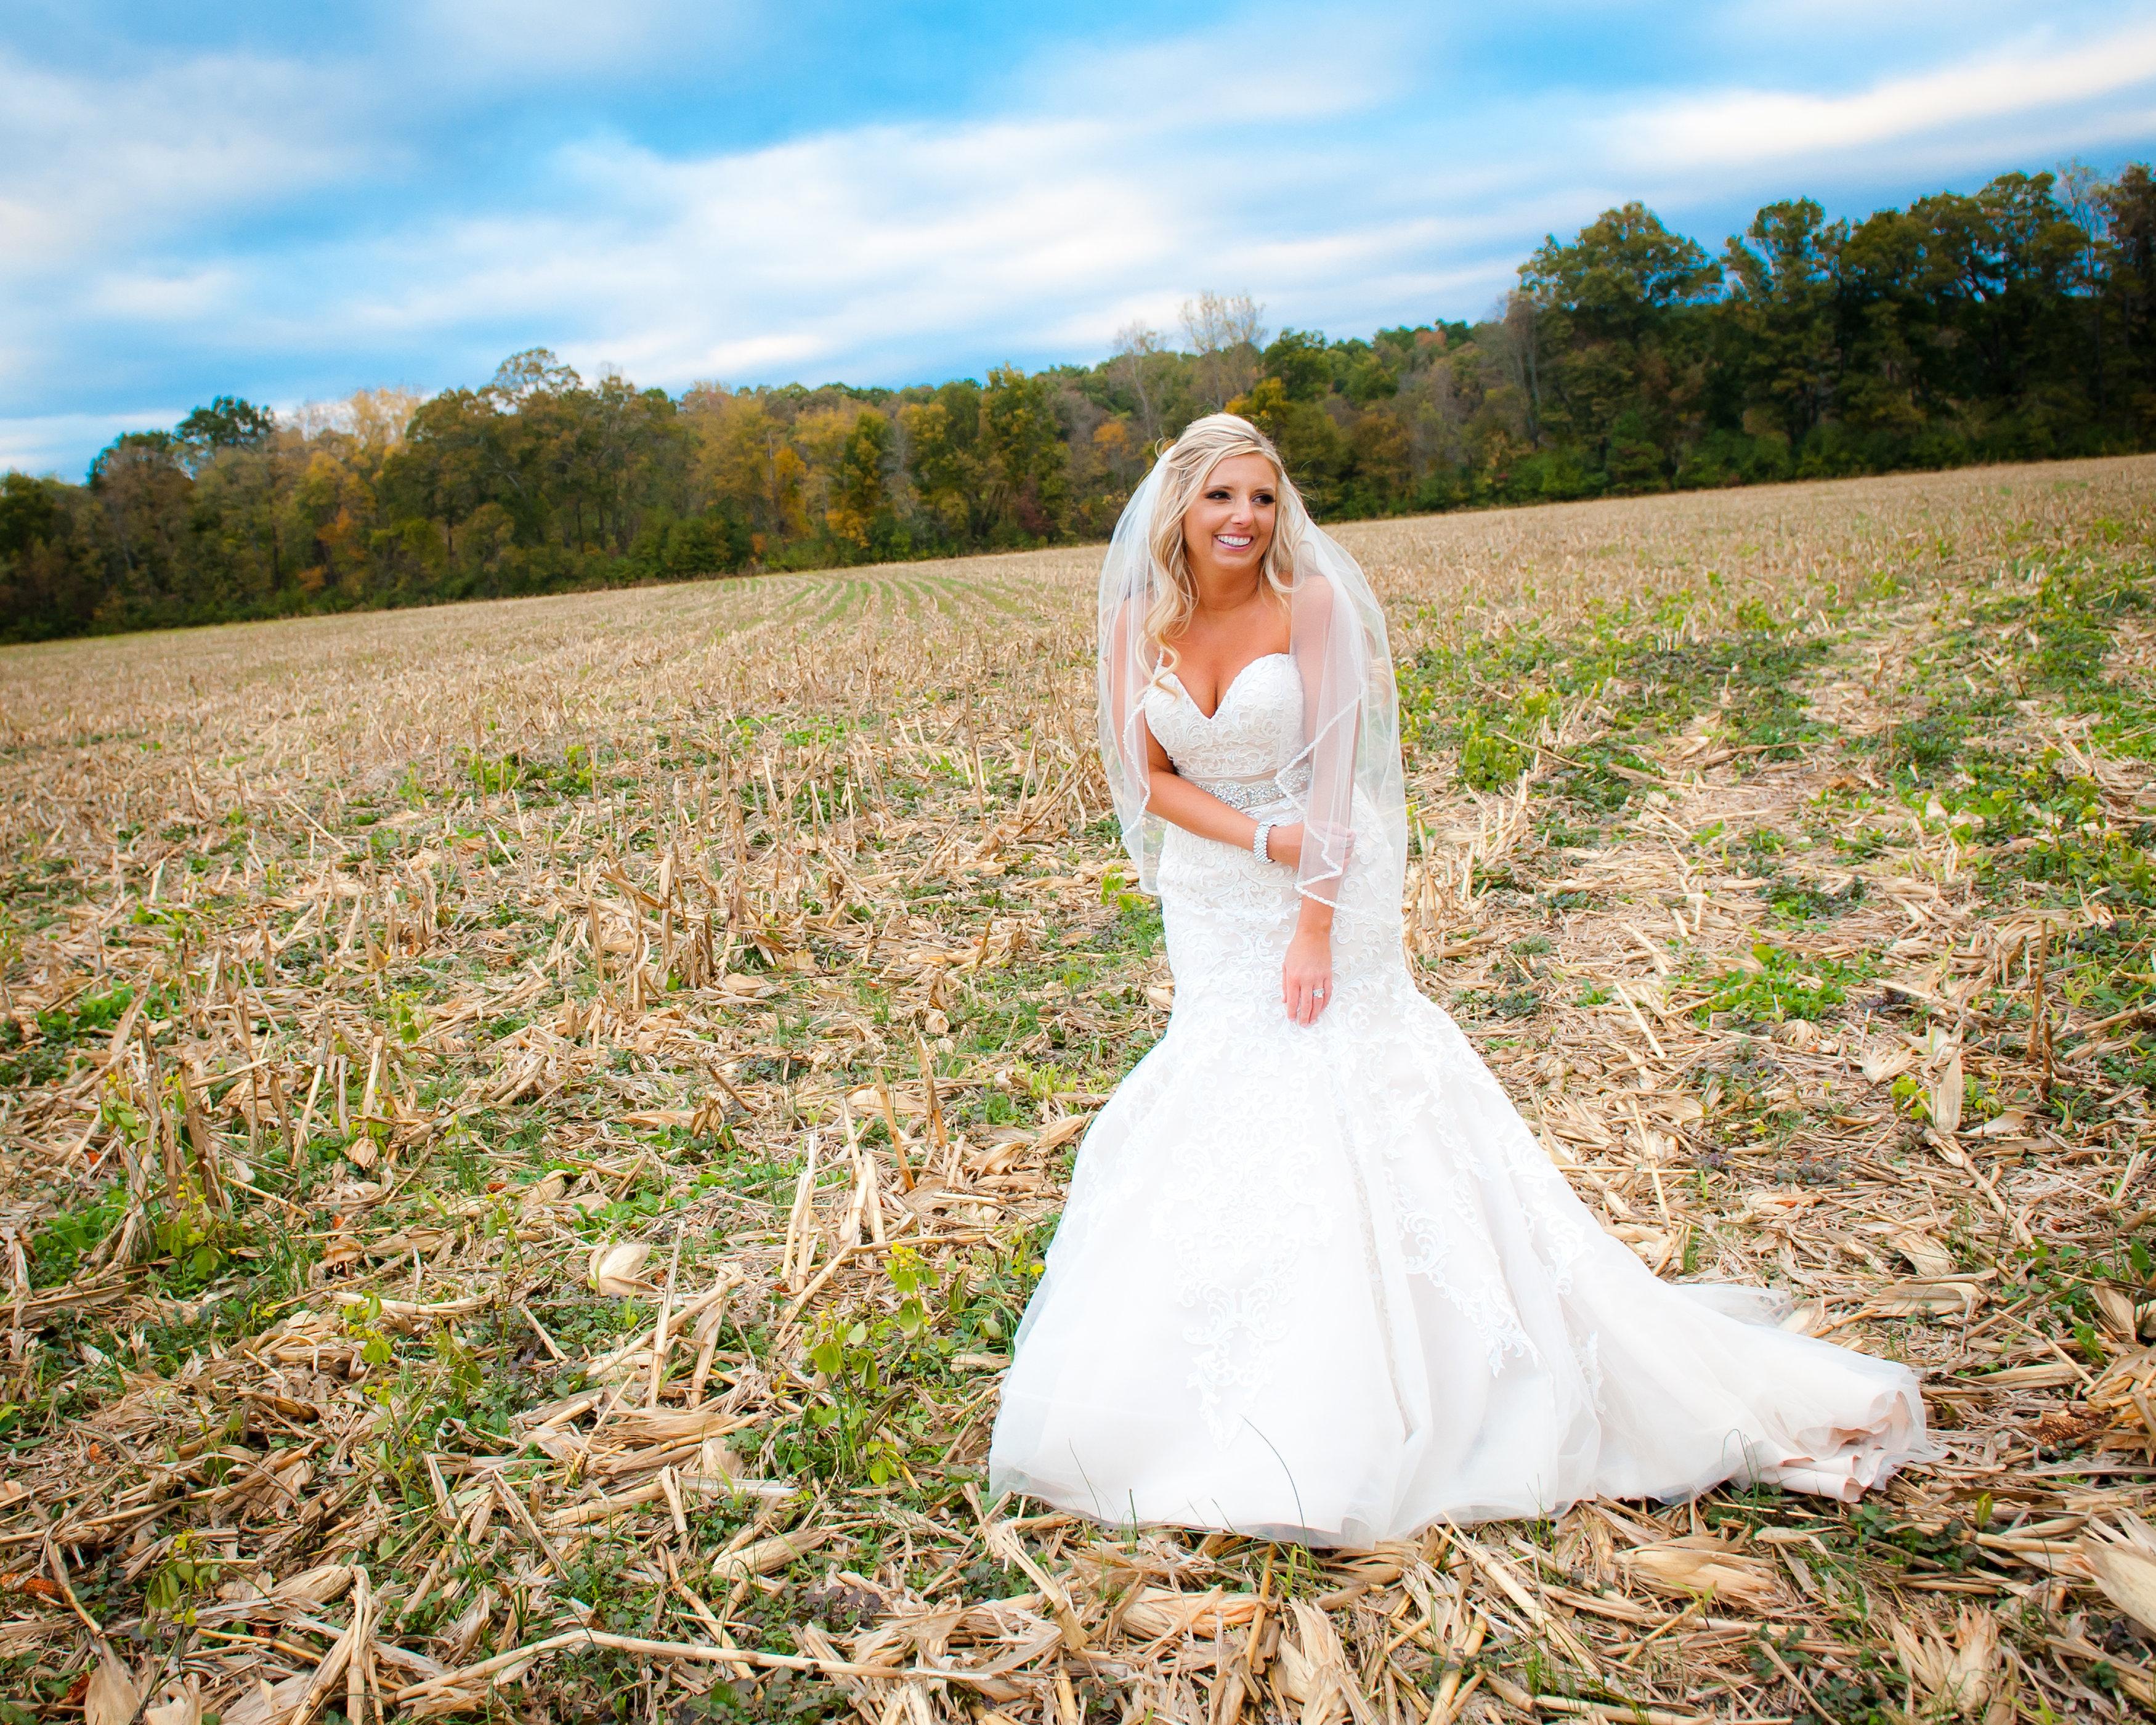 Angela + Marcus: A Fall Lakeside Rustic Wedding